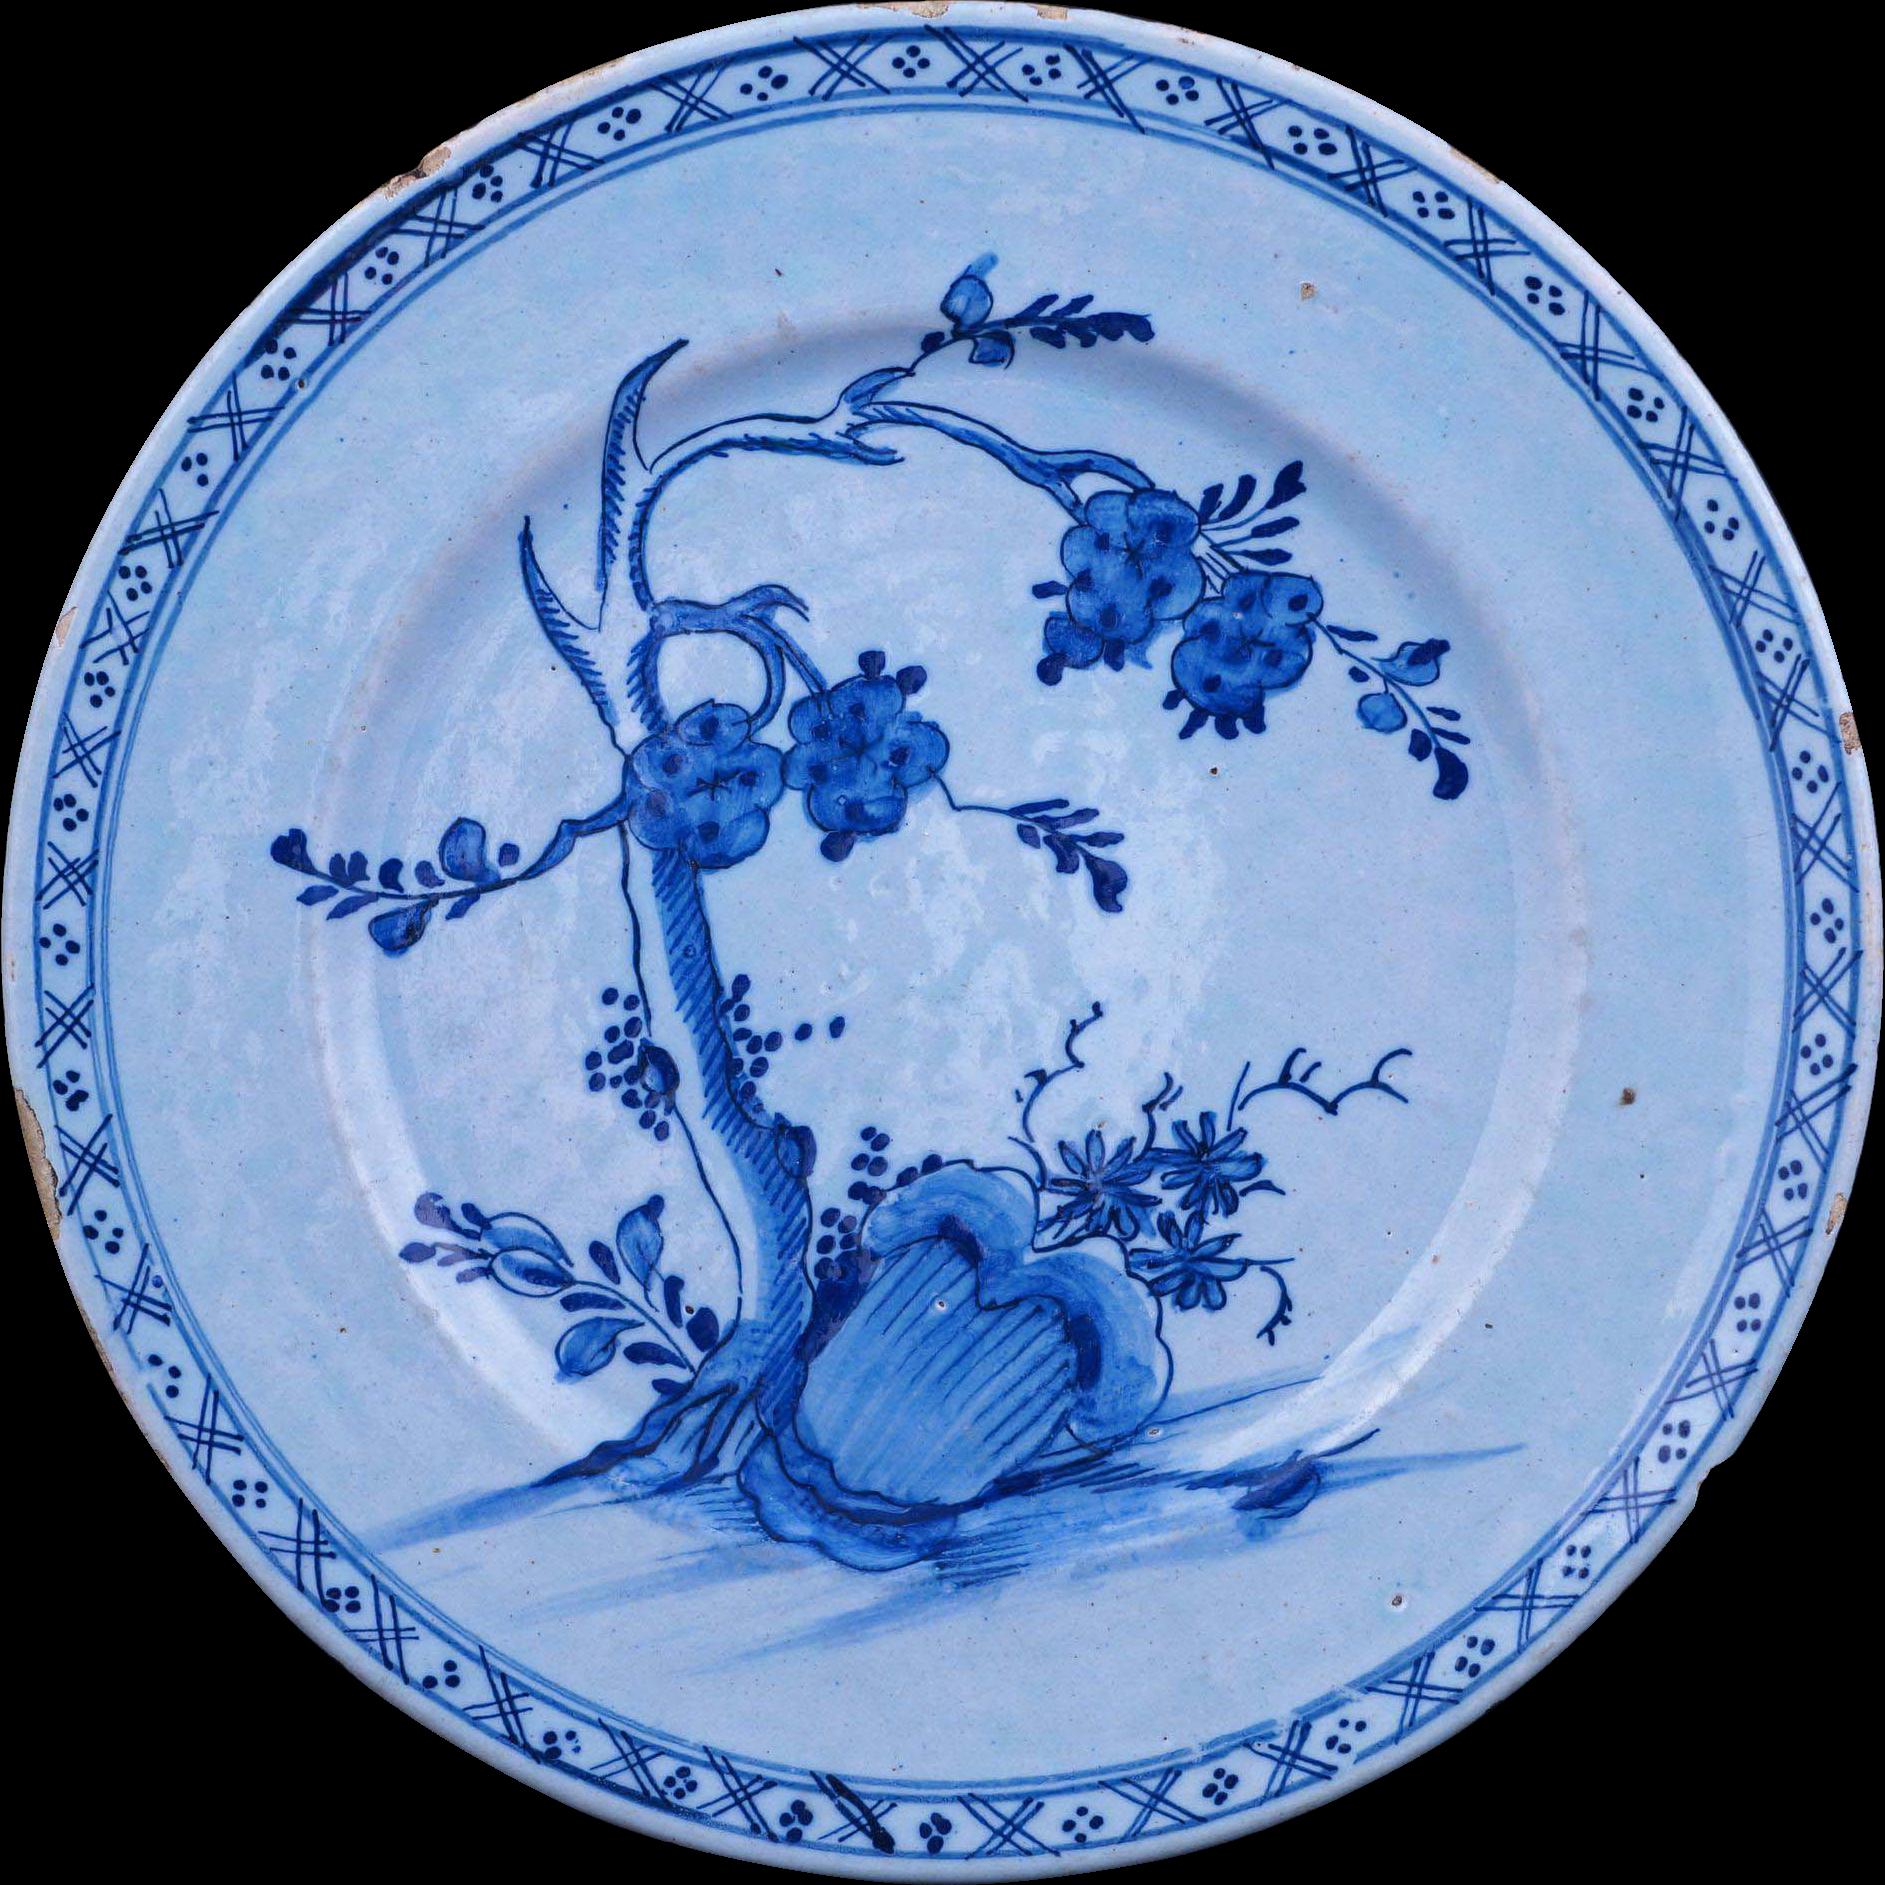 Dutch Delft Tin Glaze Plate Blue And White Kangxi Style 18th Century Blue Plates Delft Fine Porcelain